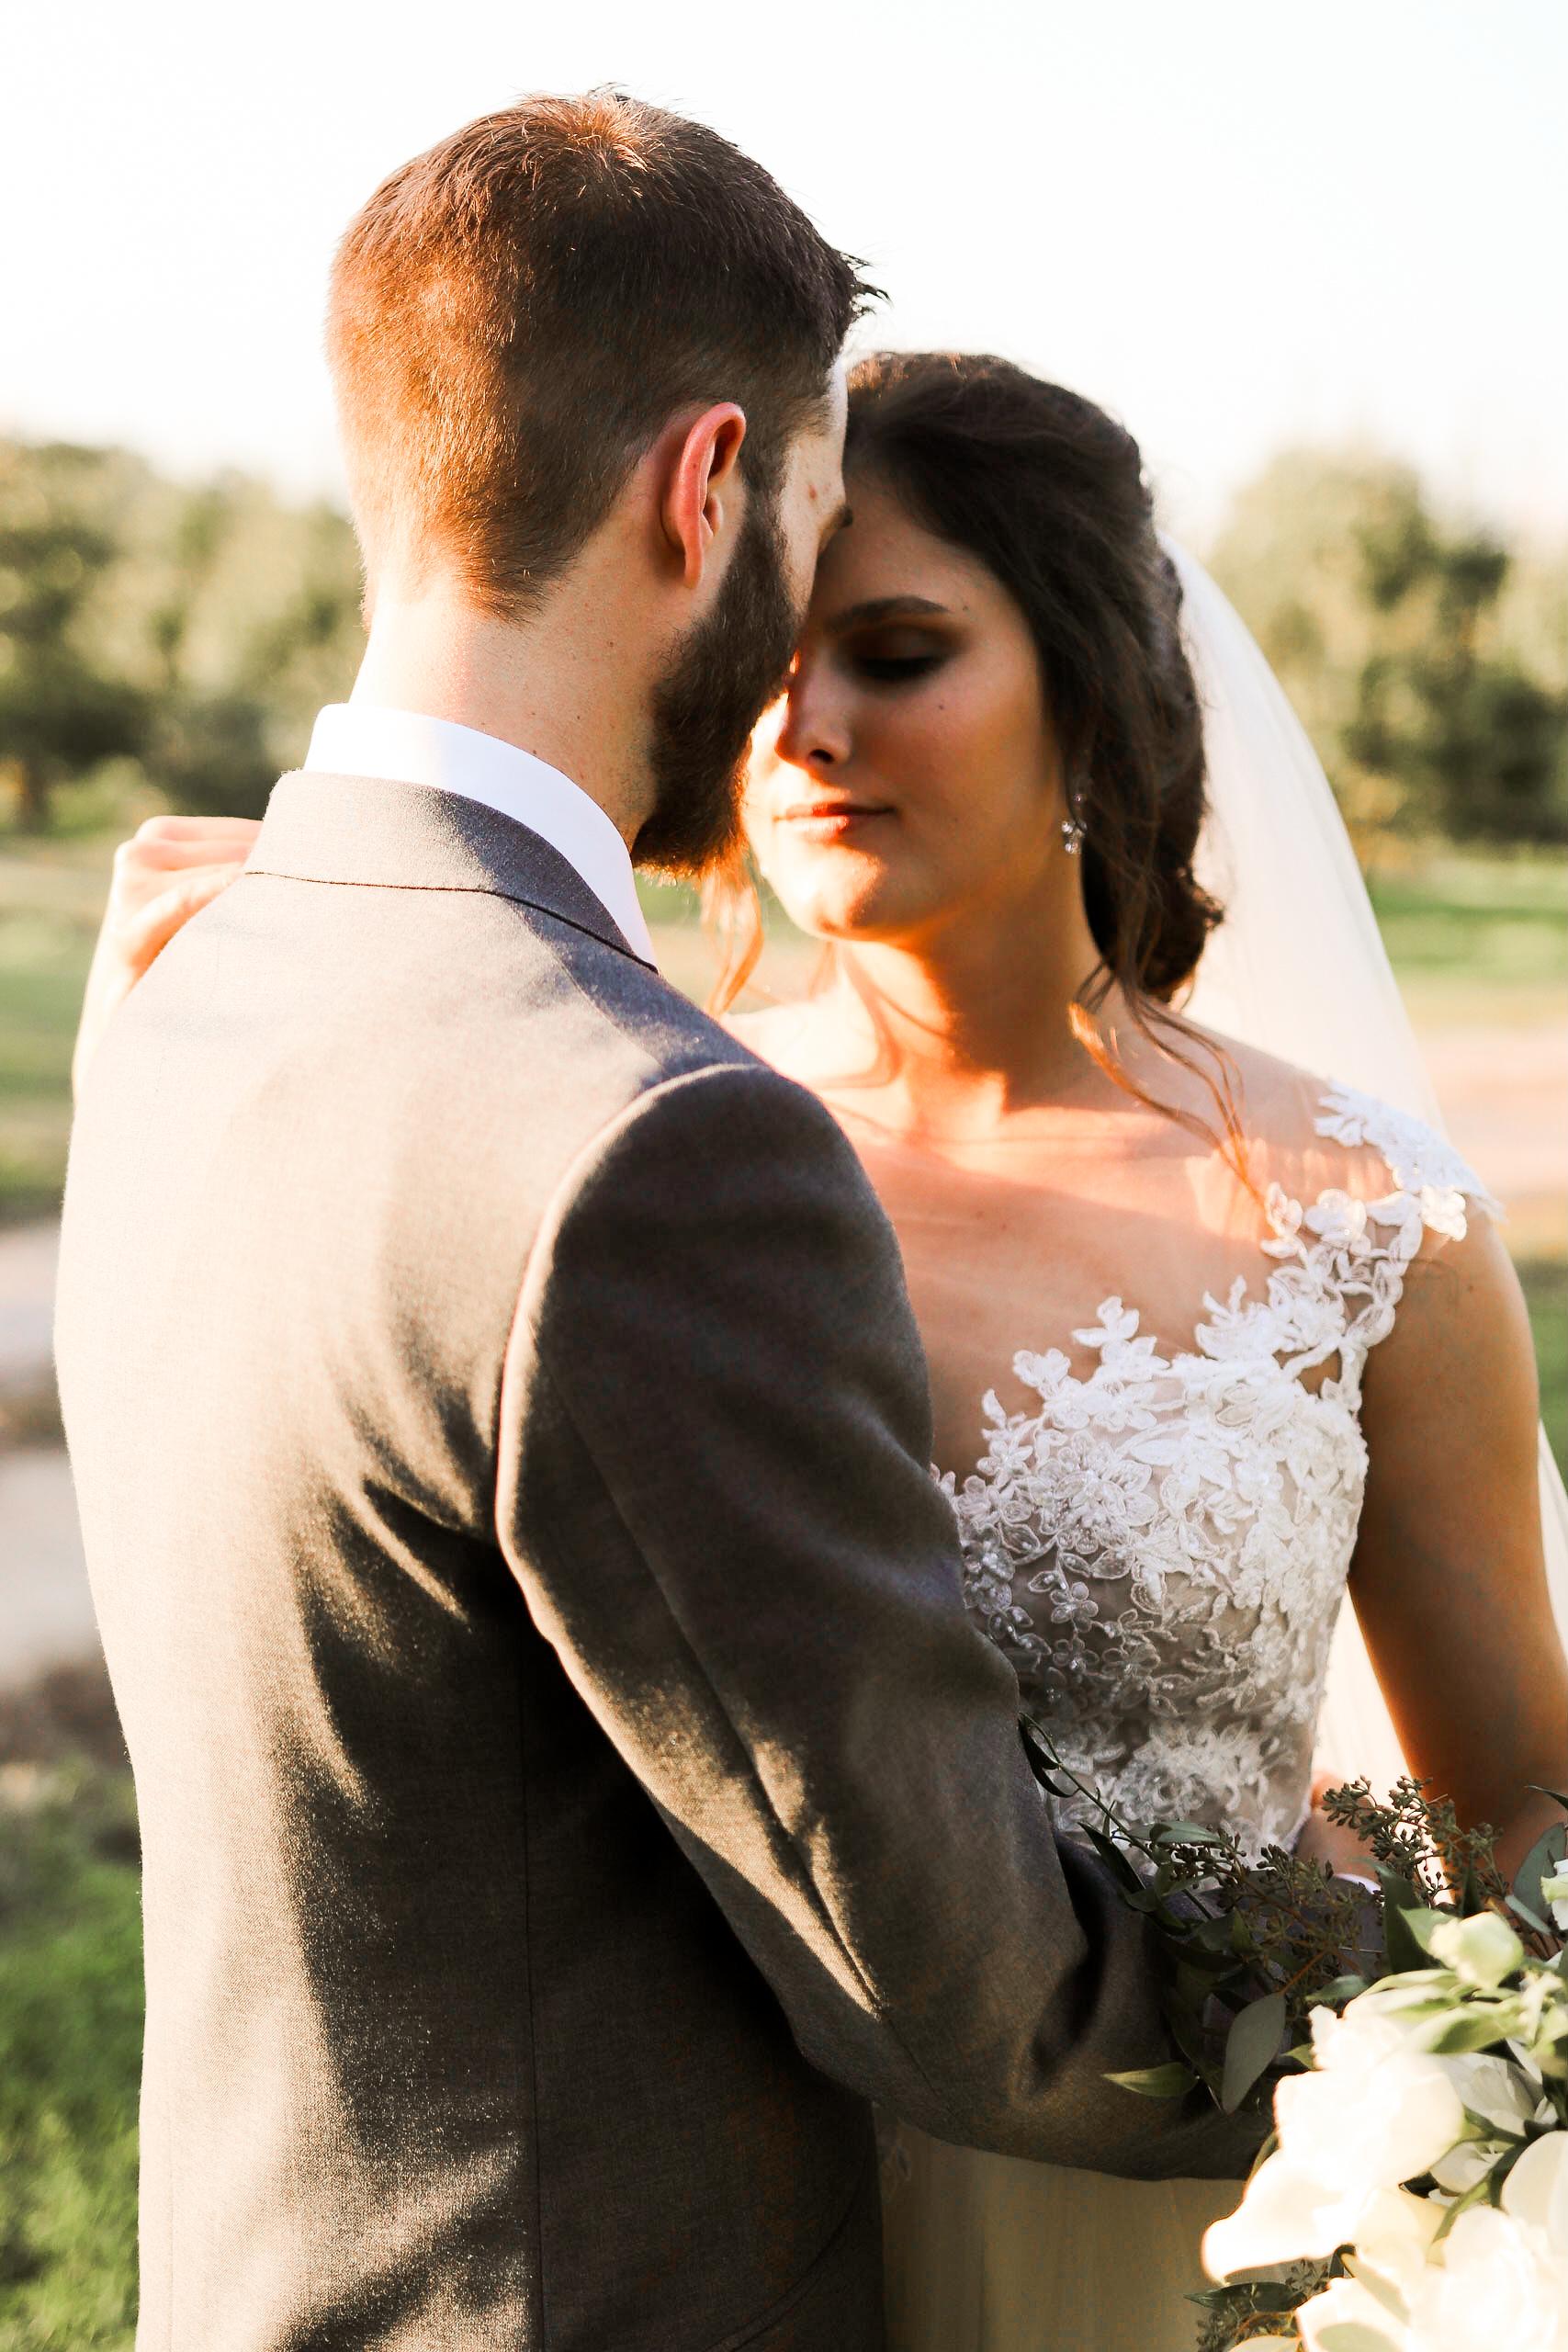 Evans-Orchard-Lexington-Kentucky-Fall-Wedding-26.jpg